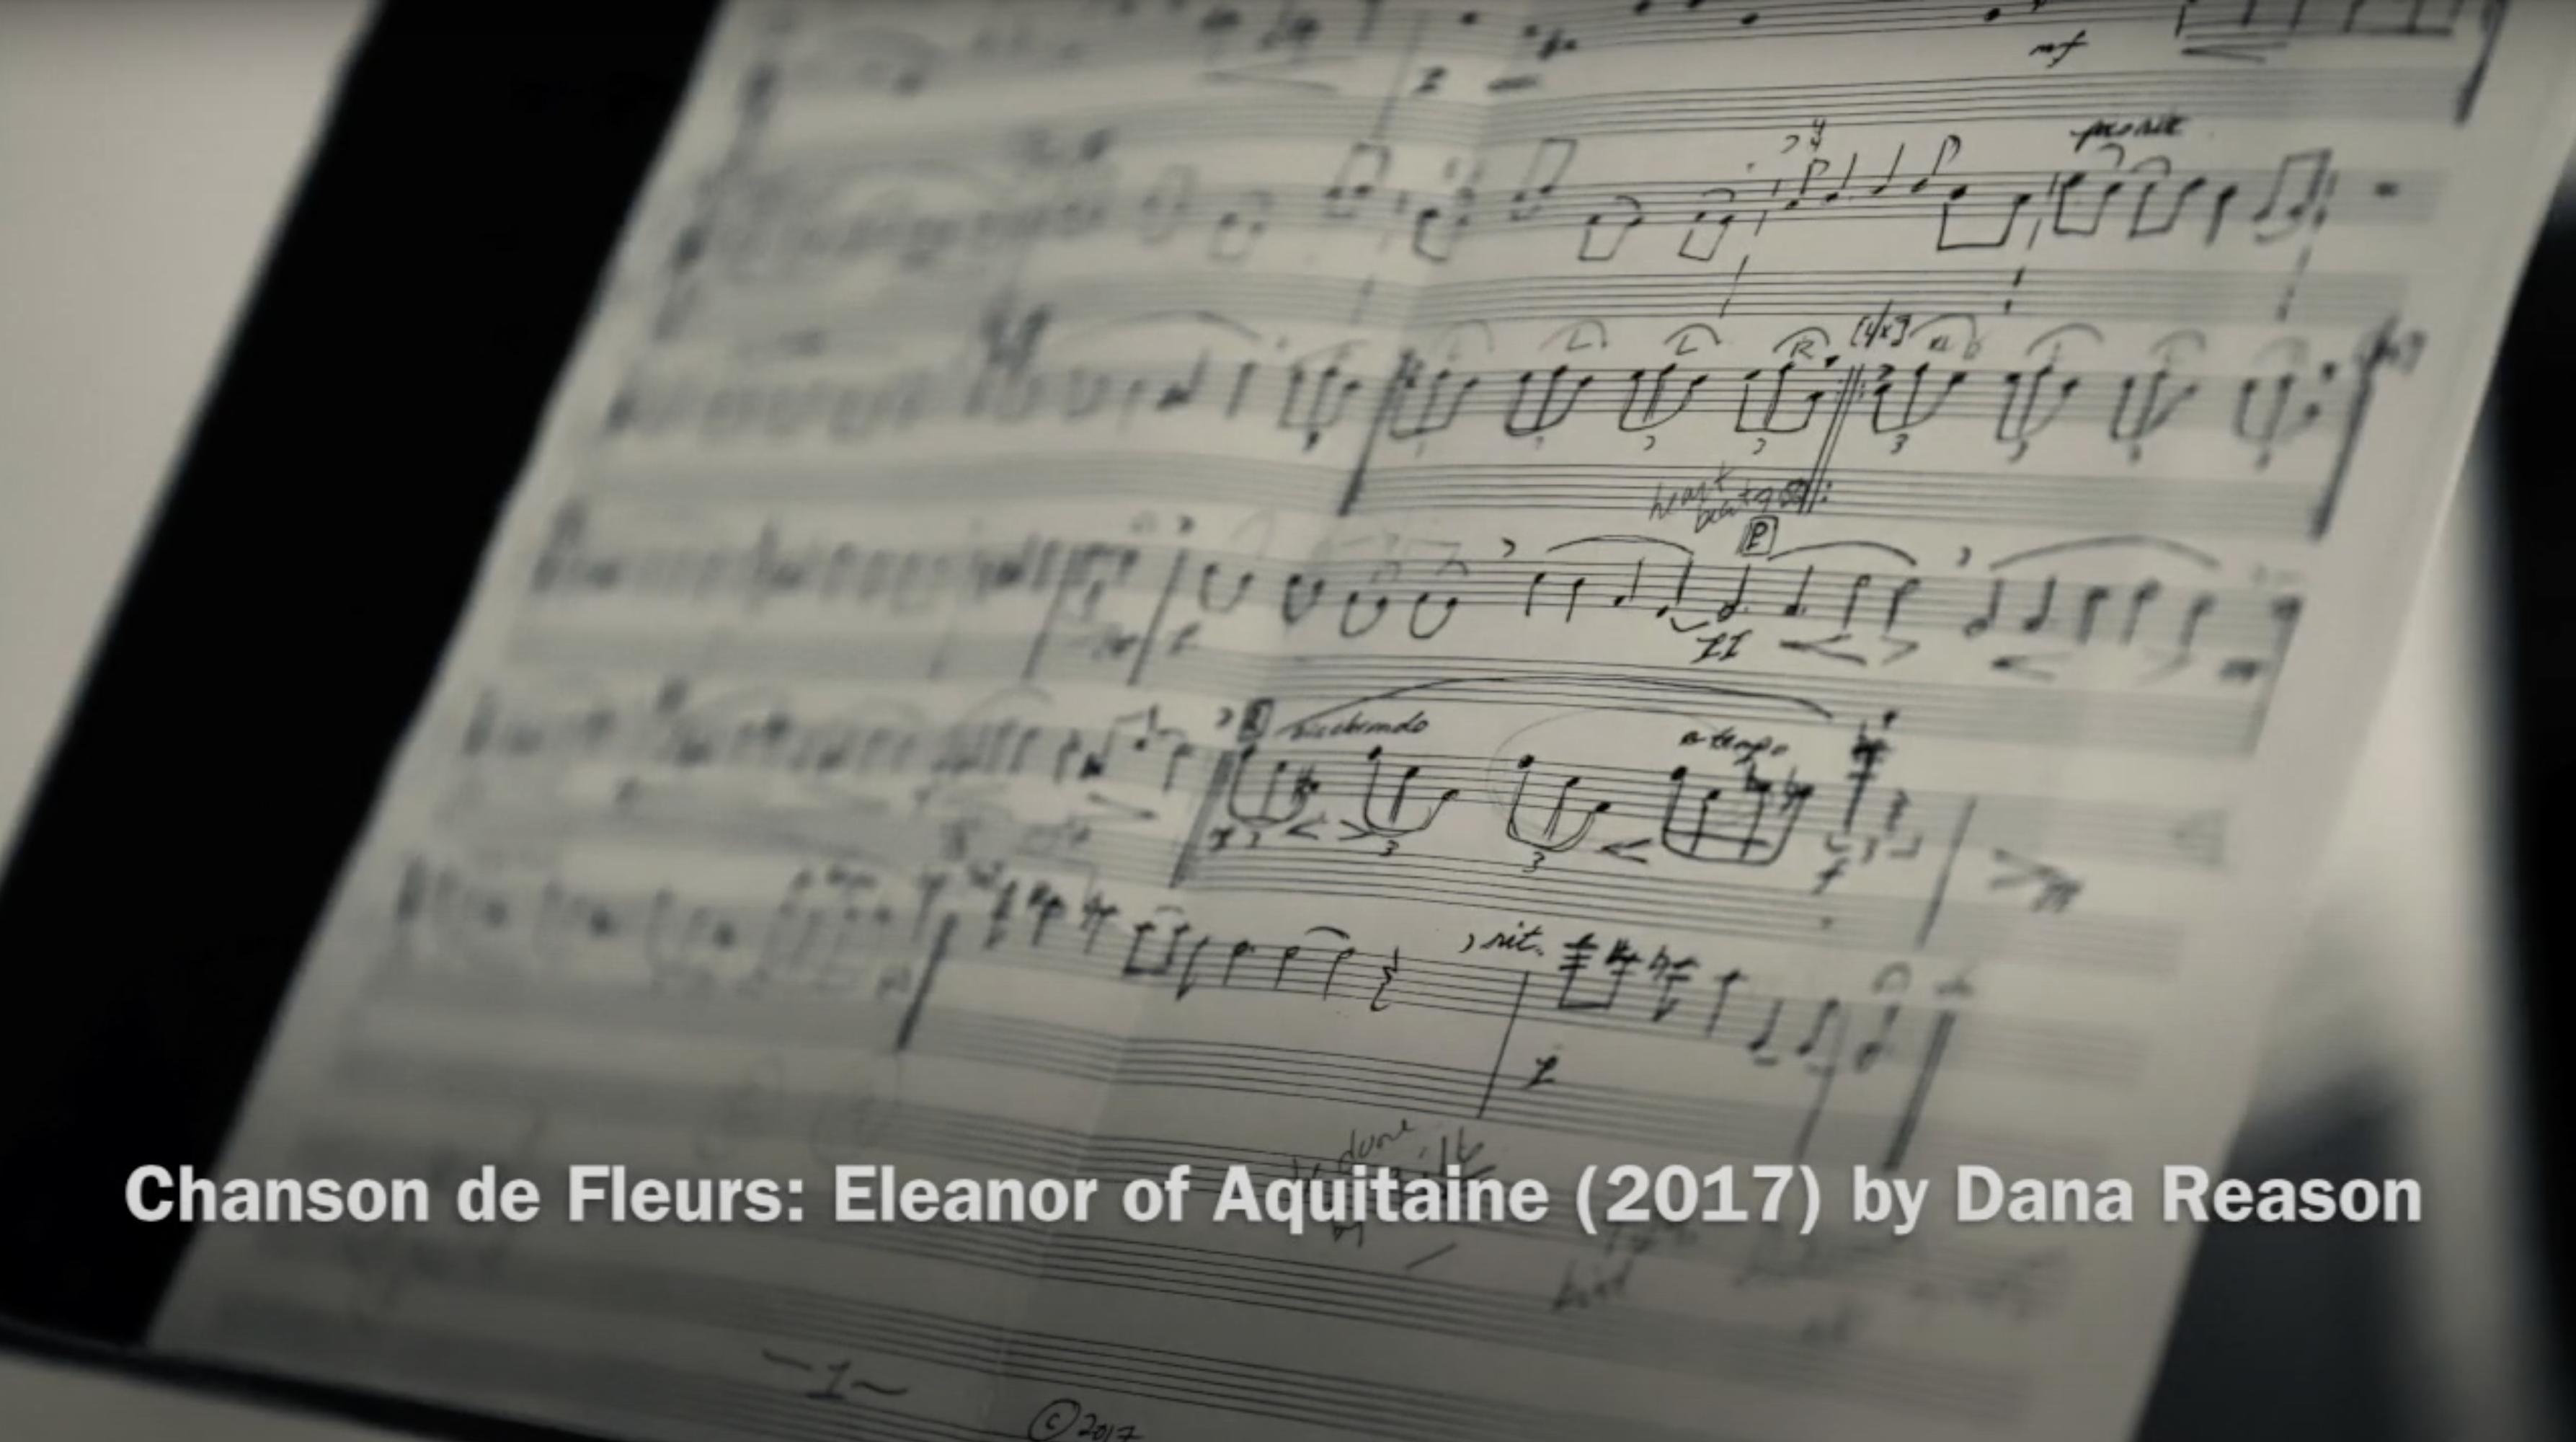 Chanson de Fleurs: Eleanor of Aquitaine (2017) for oboe and soundscape by Dana Reason